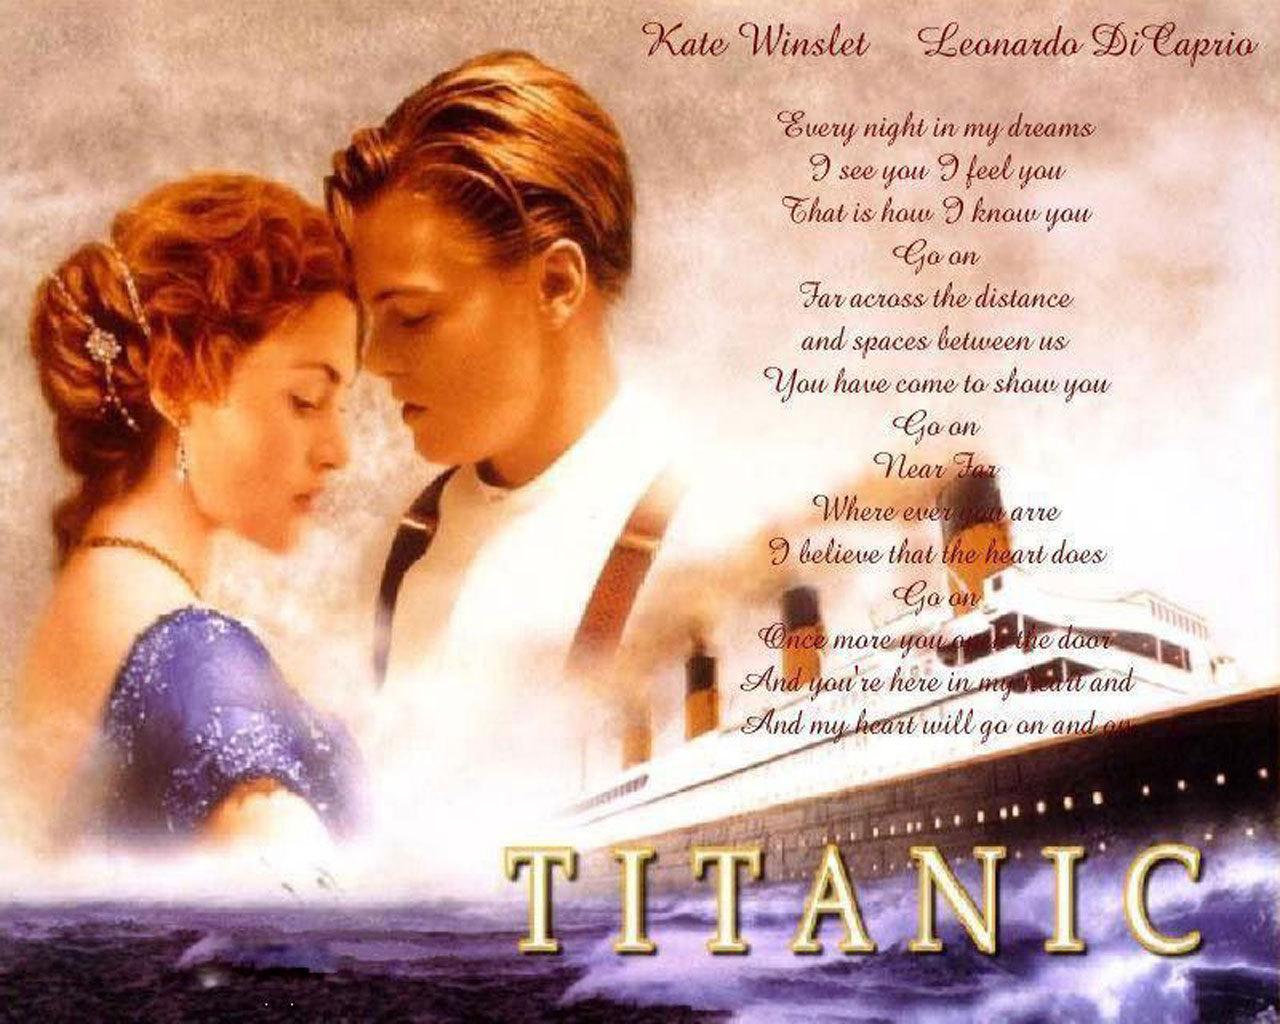 Jack and rose - Titanic Wallpaper (10638639) - Fanpop